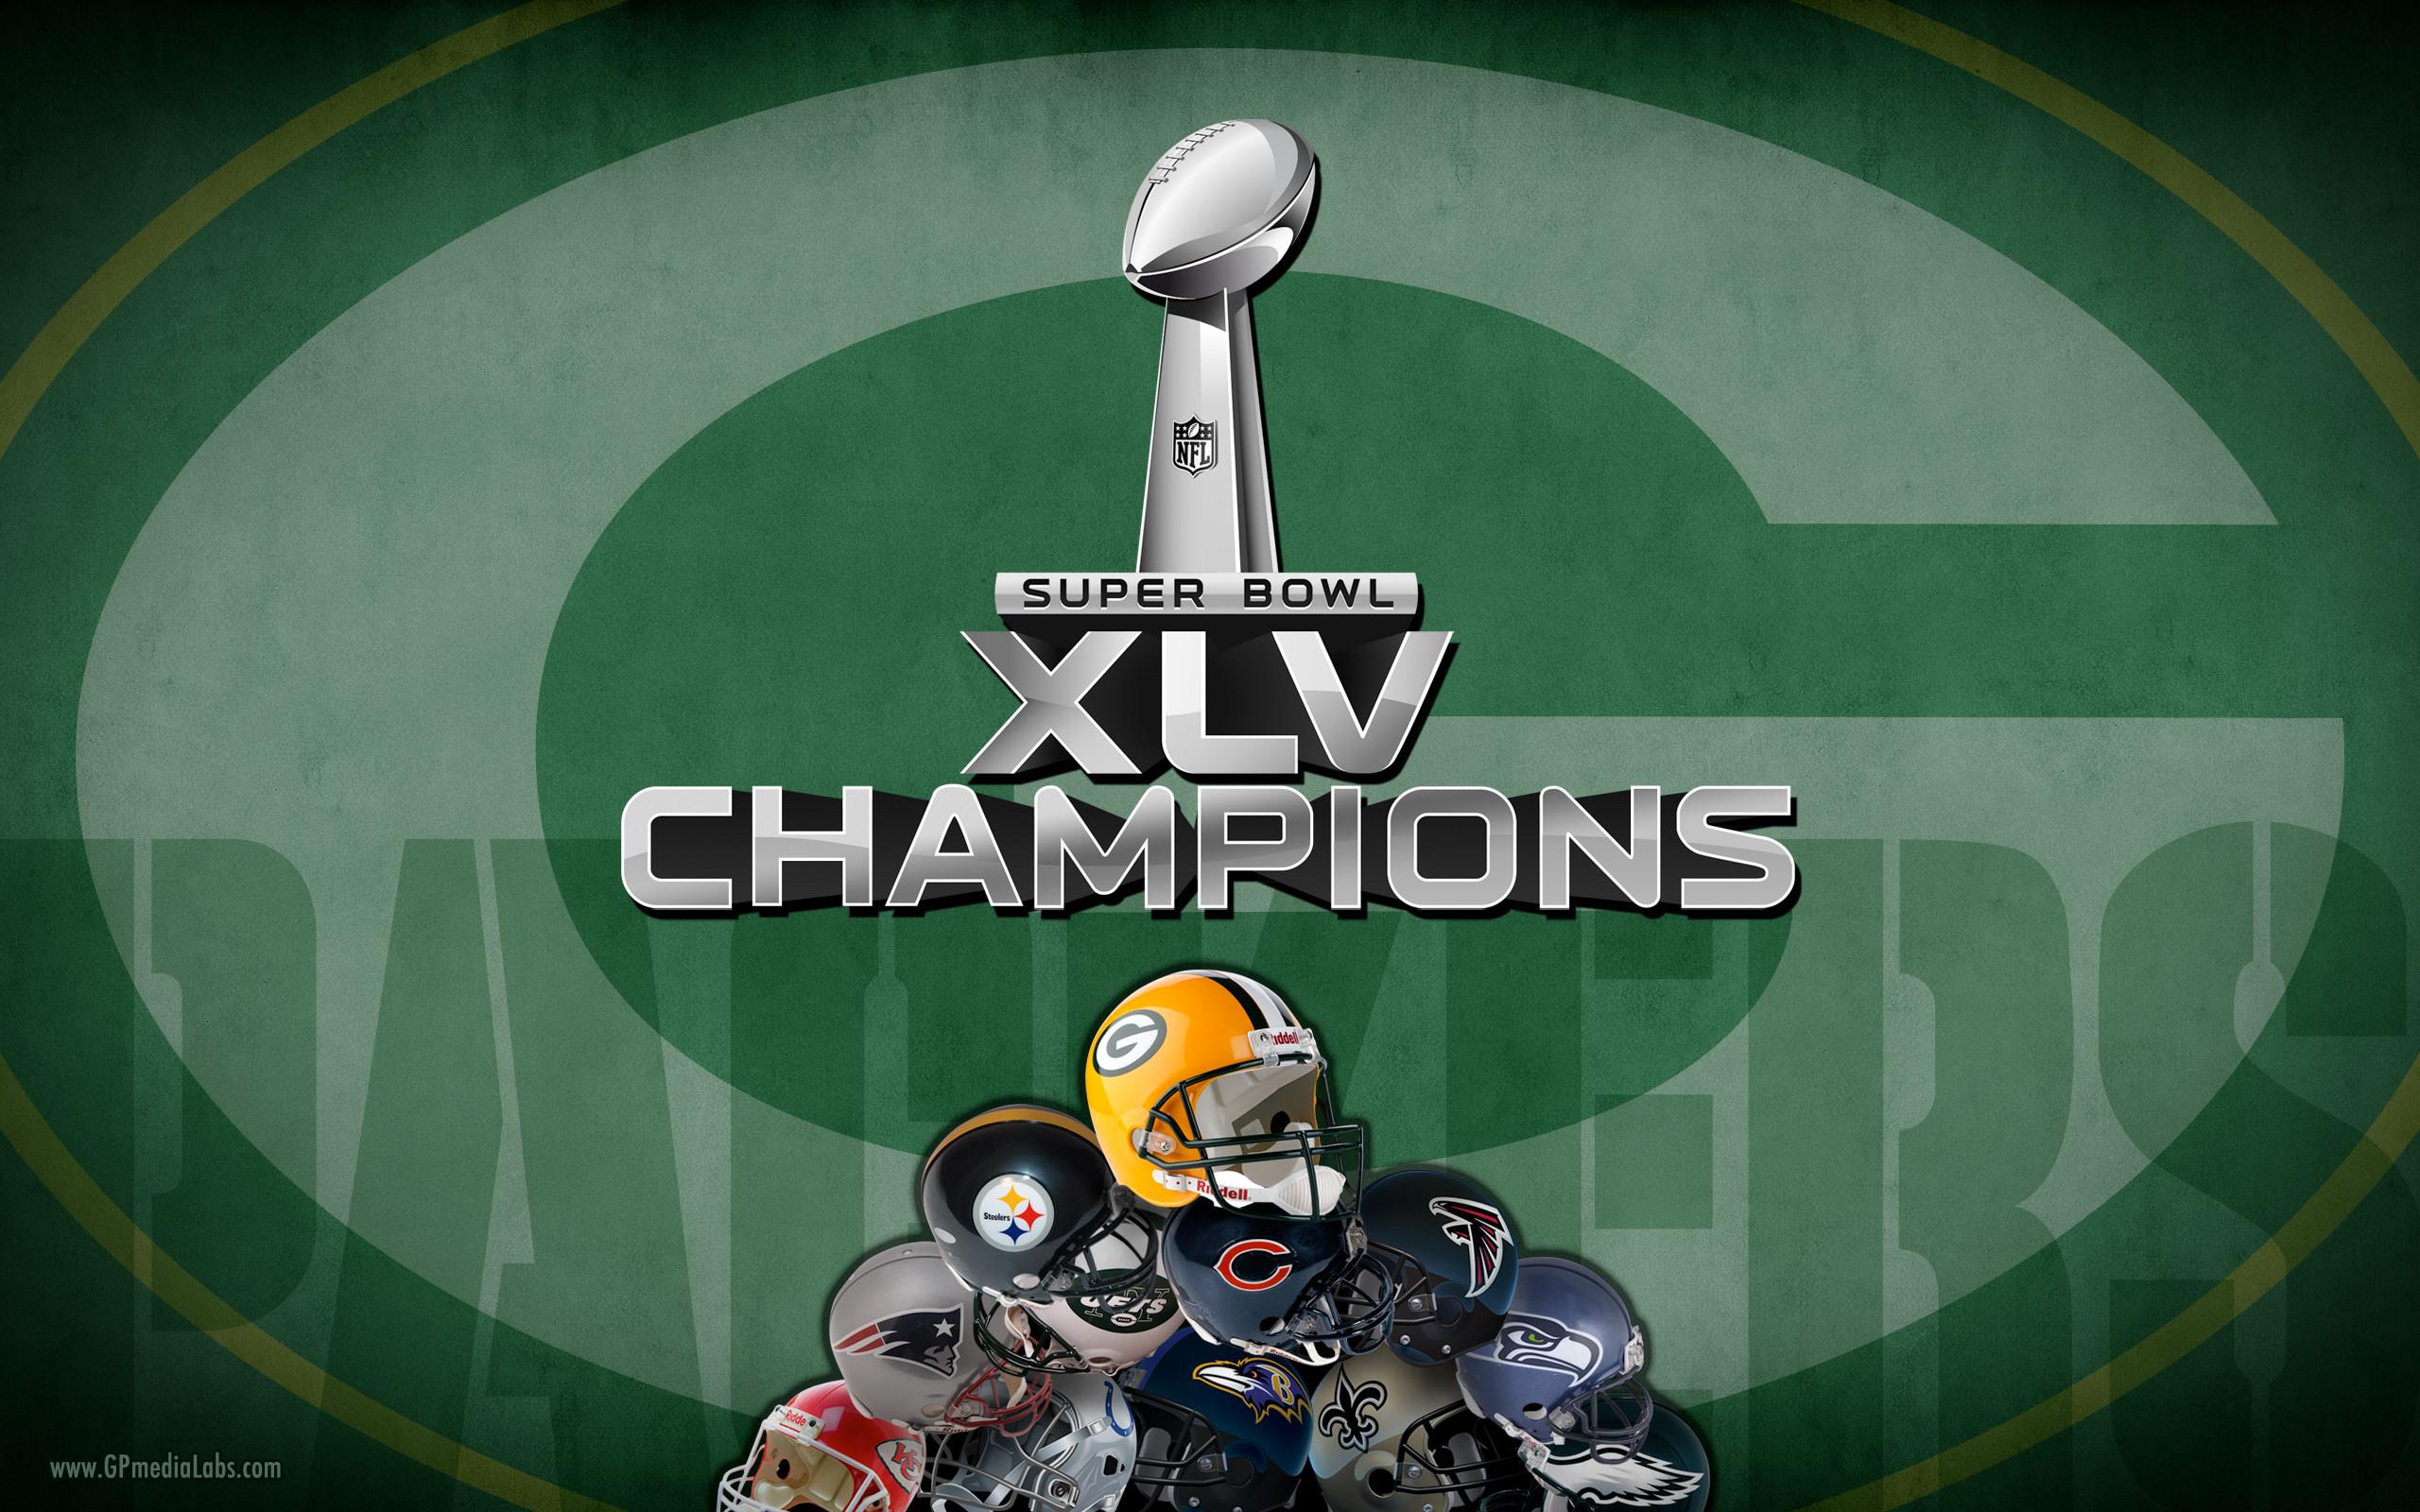 Green Bay Packers Wallpaper – Super Bowl Champions